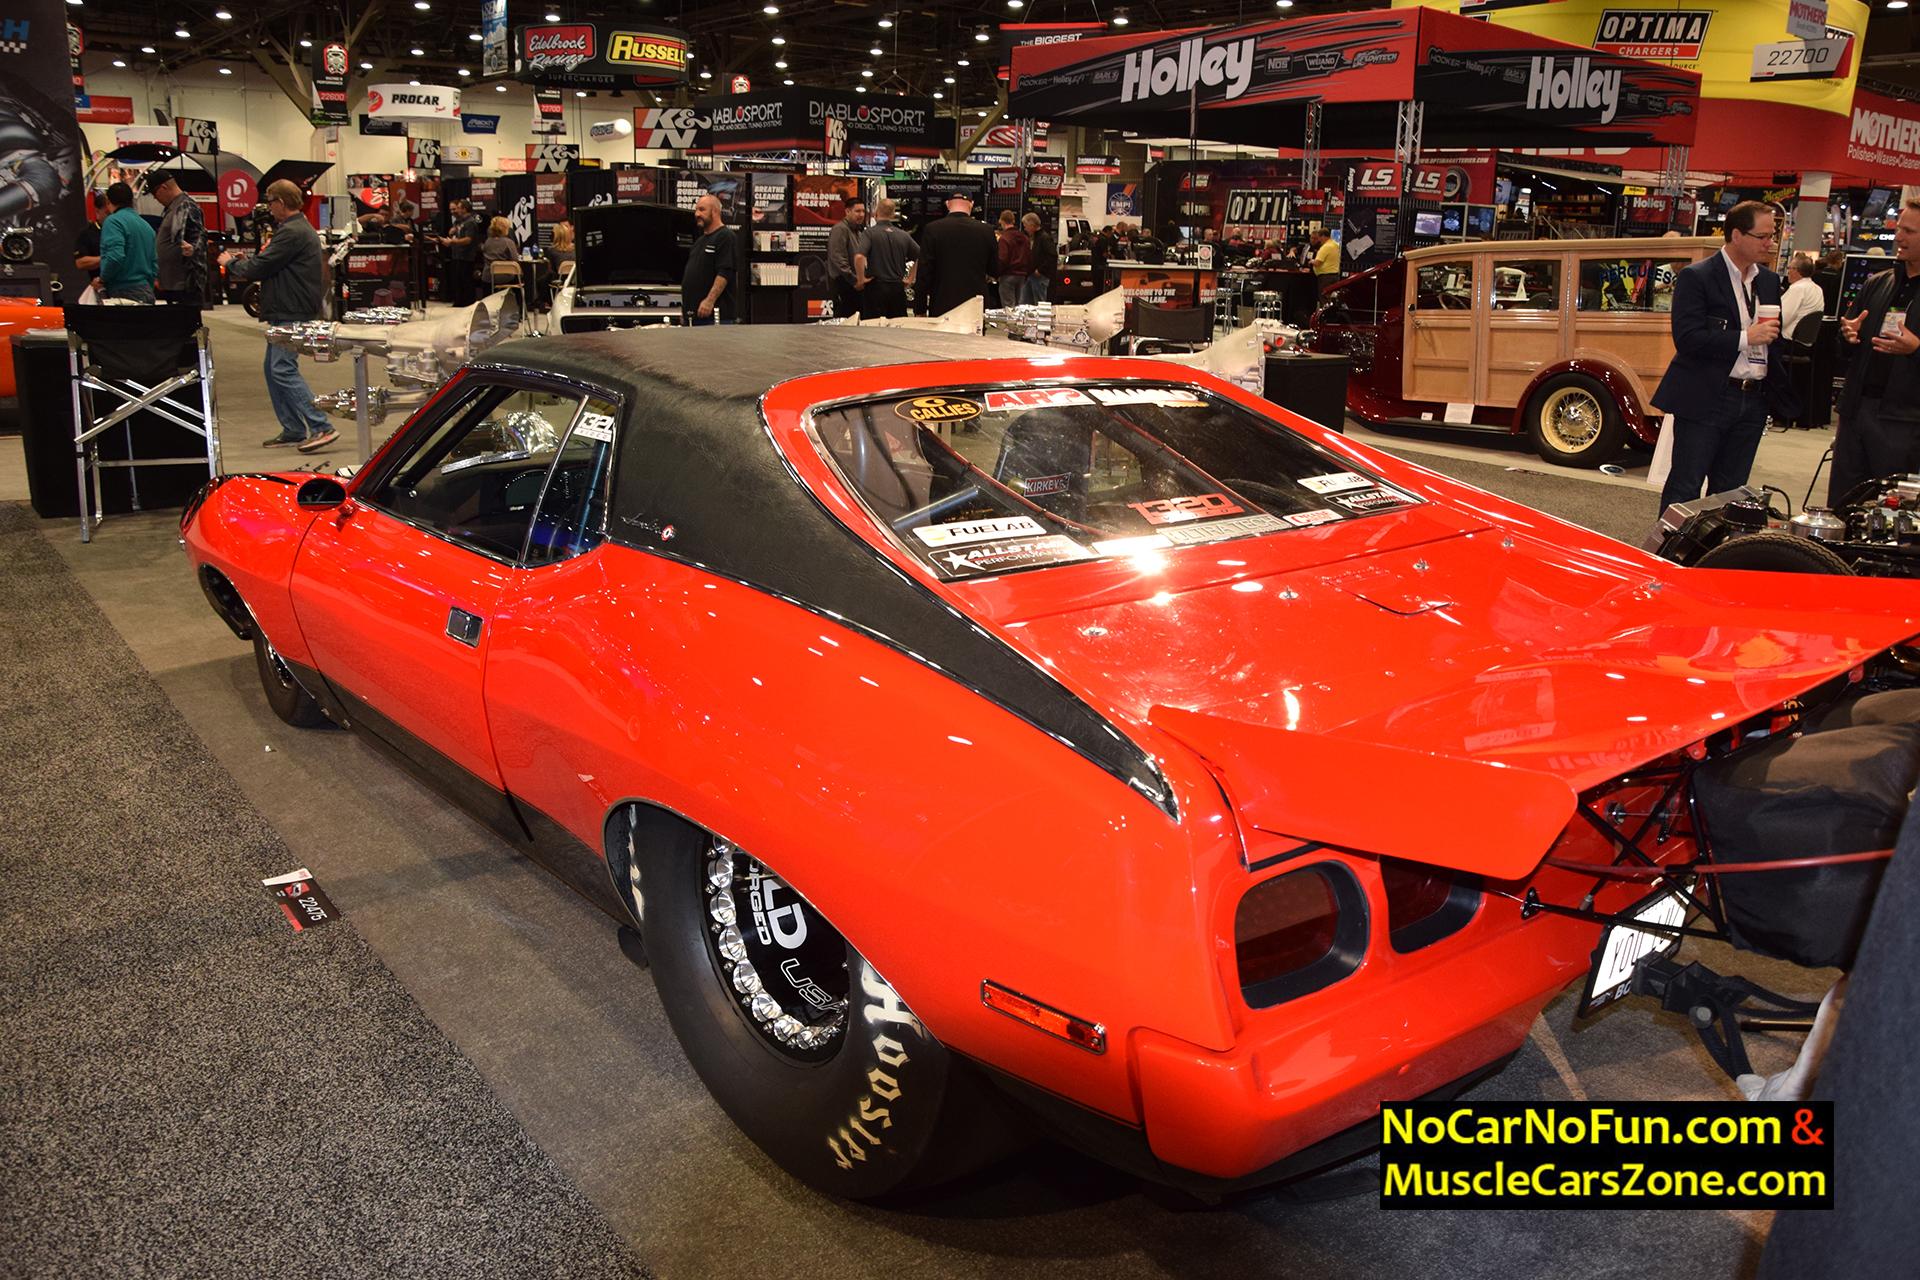 1973 Amc Javelin Ultra Tech Racing Engines 221b Drag Car